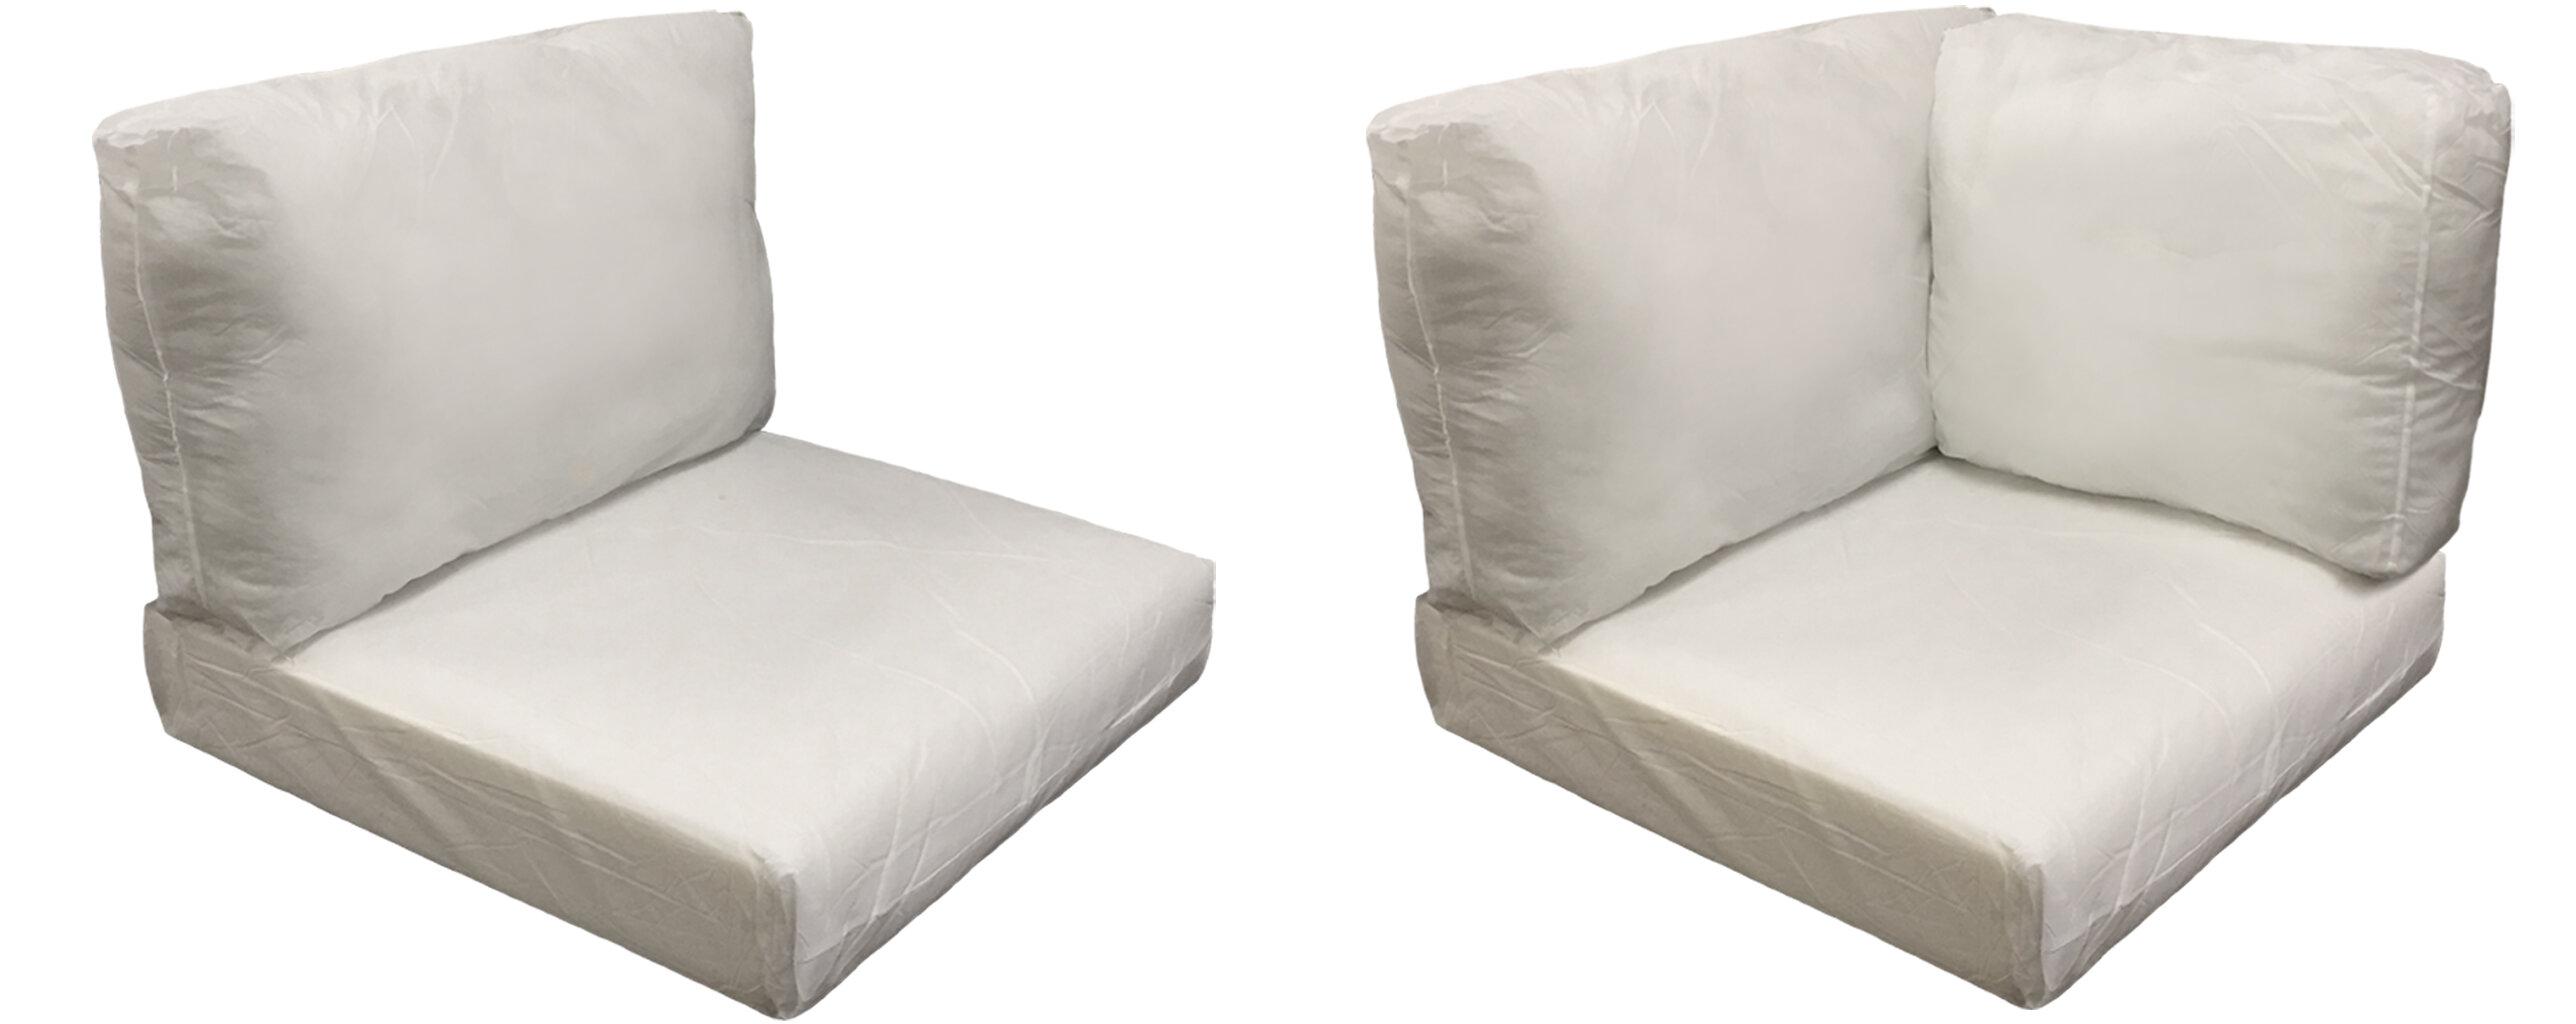 Estrella Outdoor 24 Piece Lounge Chair Cushion Insert Set